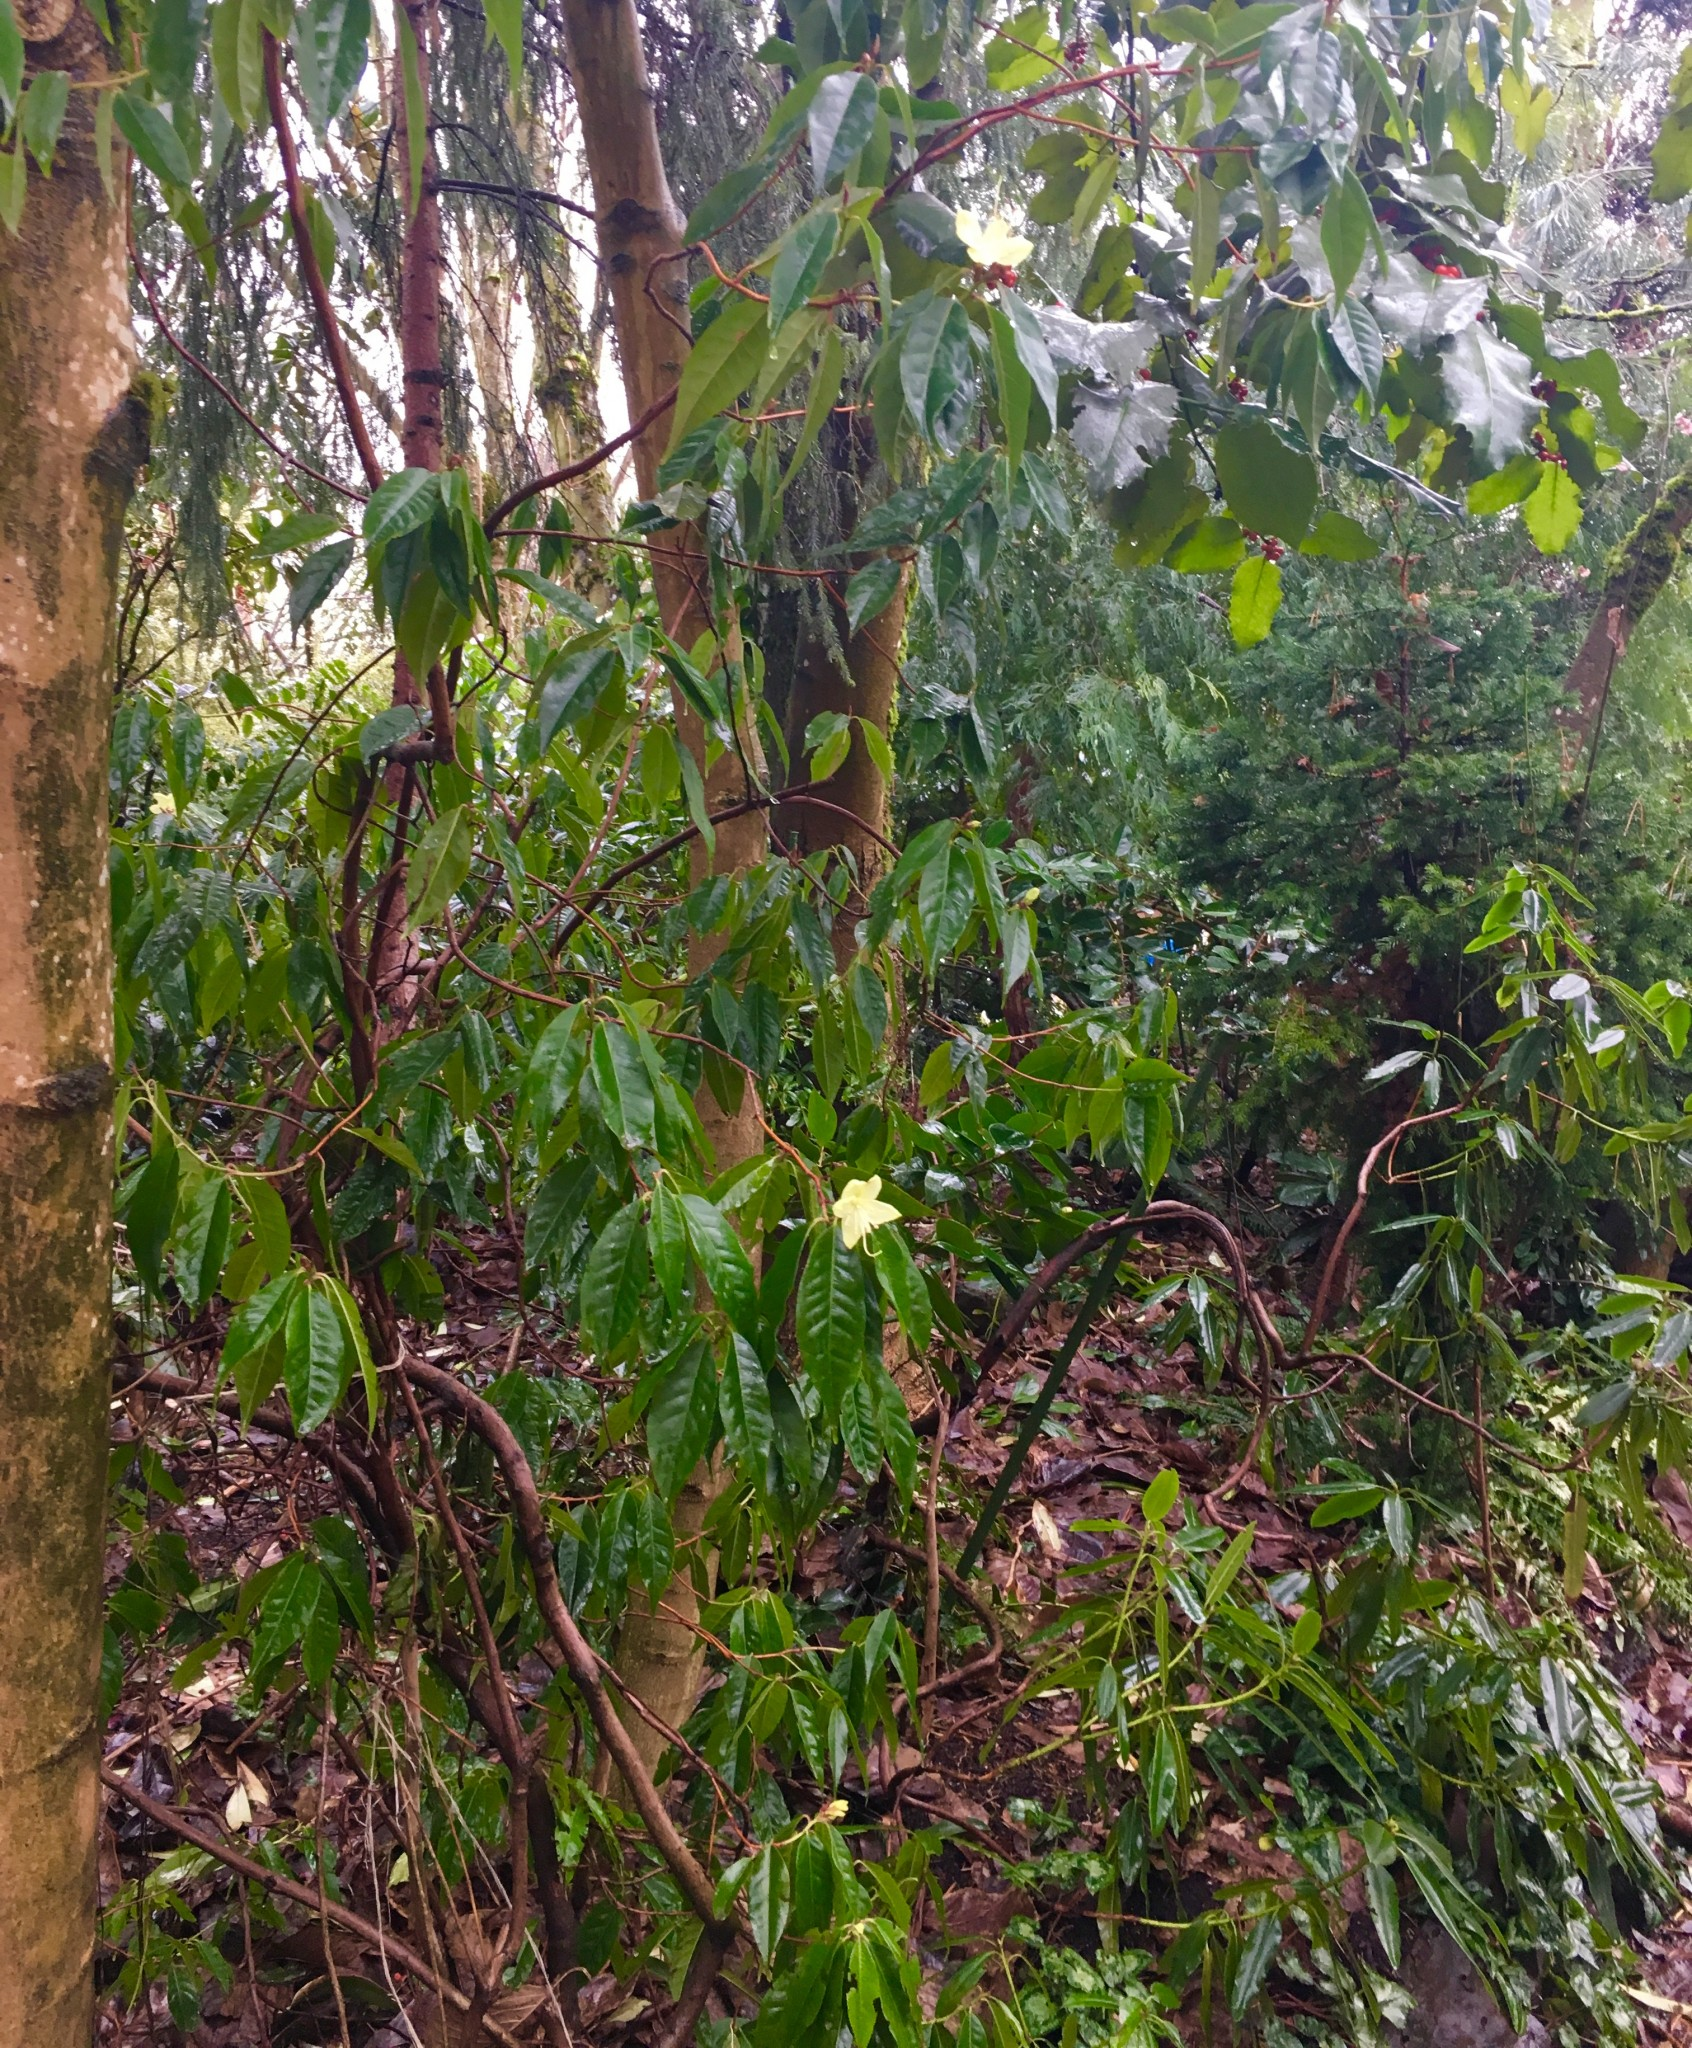 A wider shot. A leggy shrub or a vine?